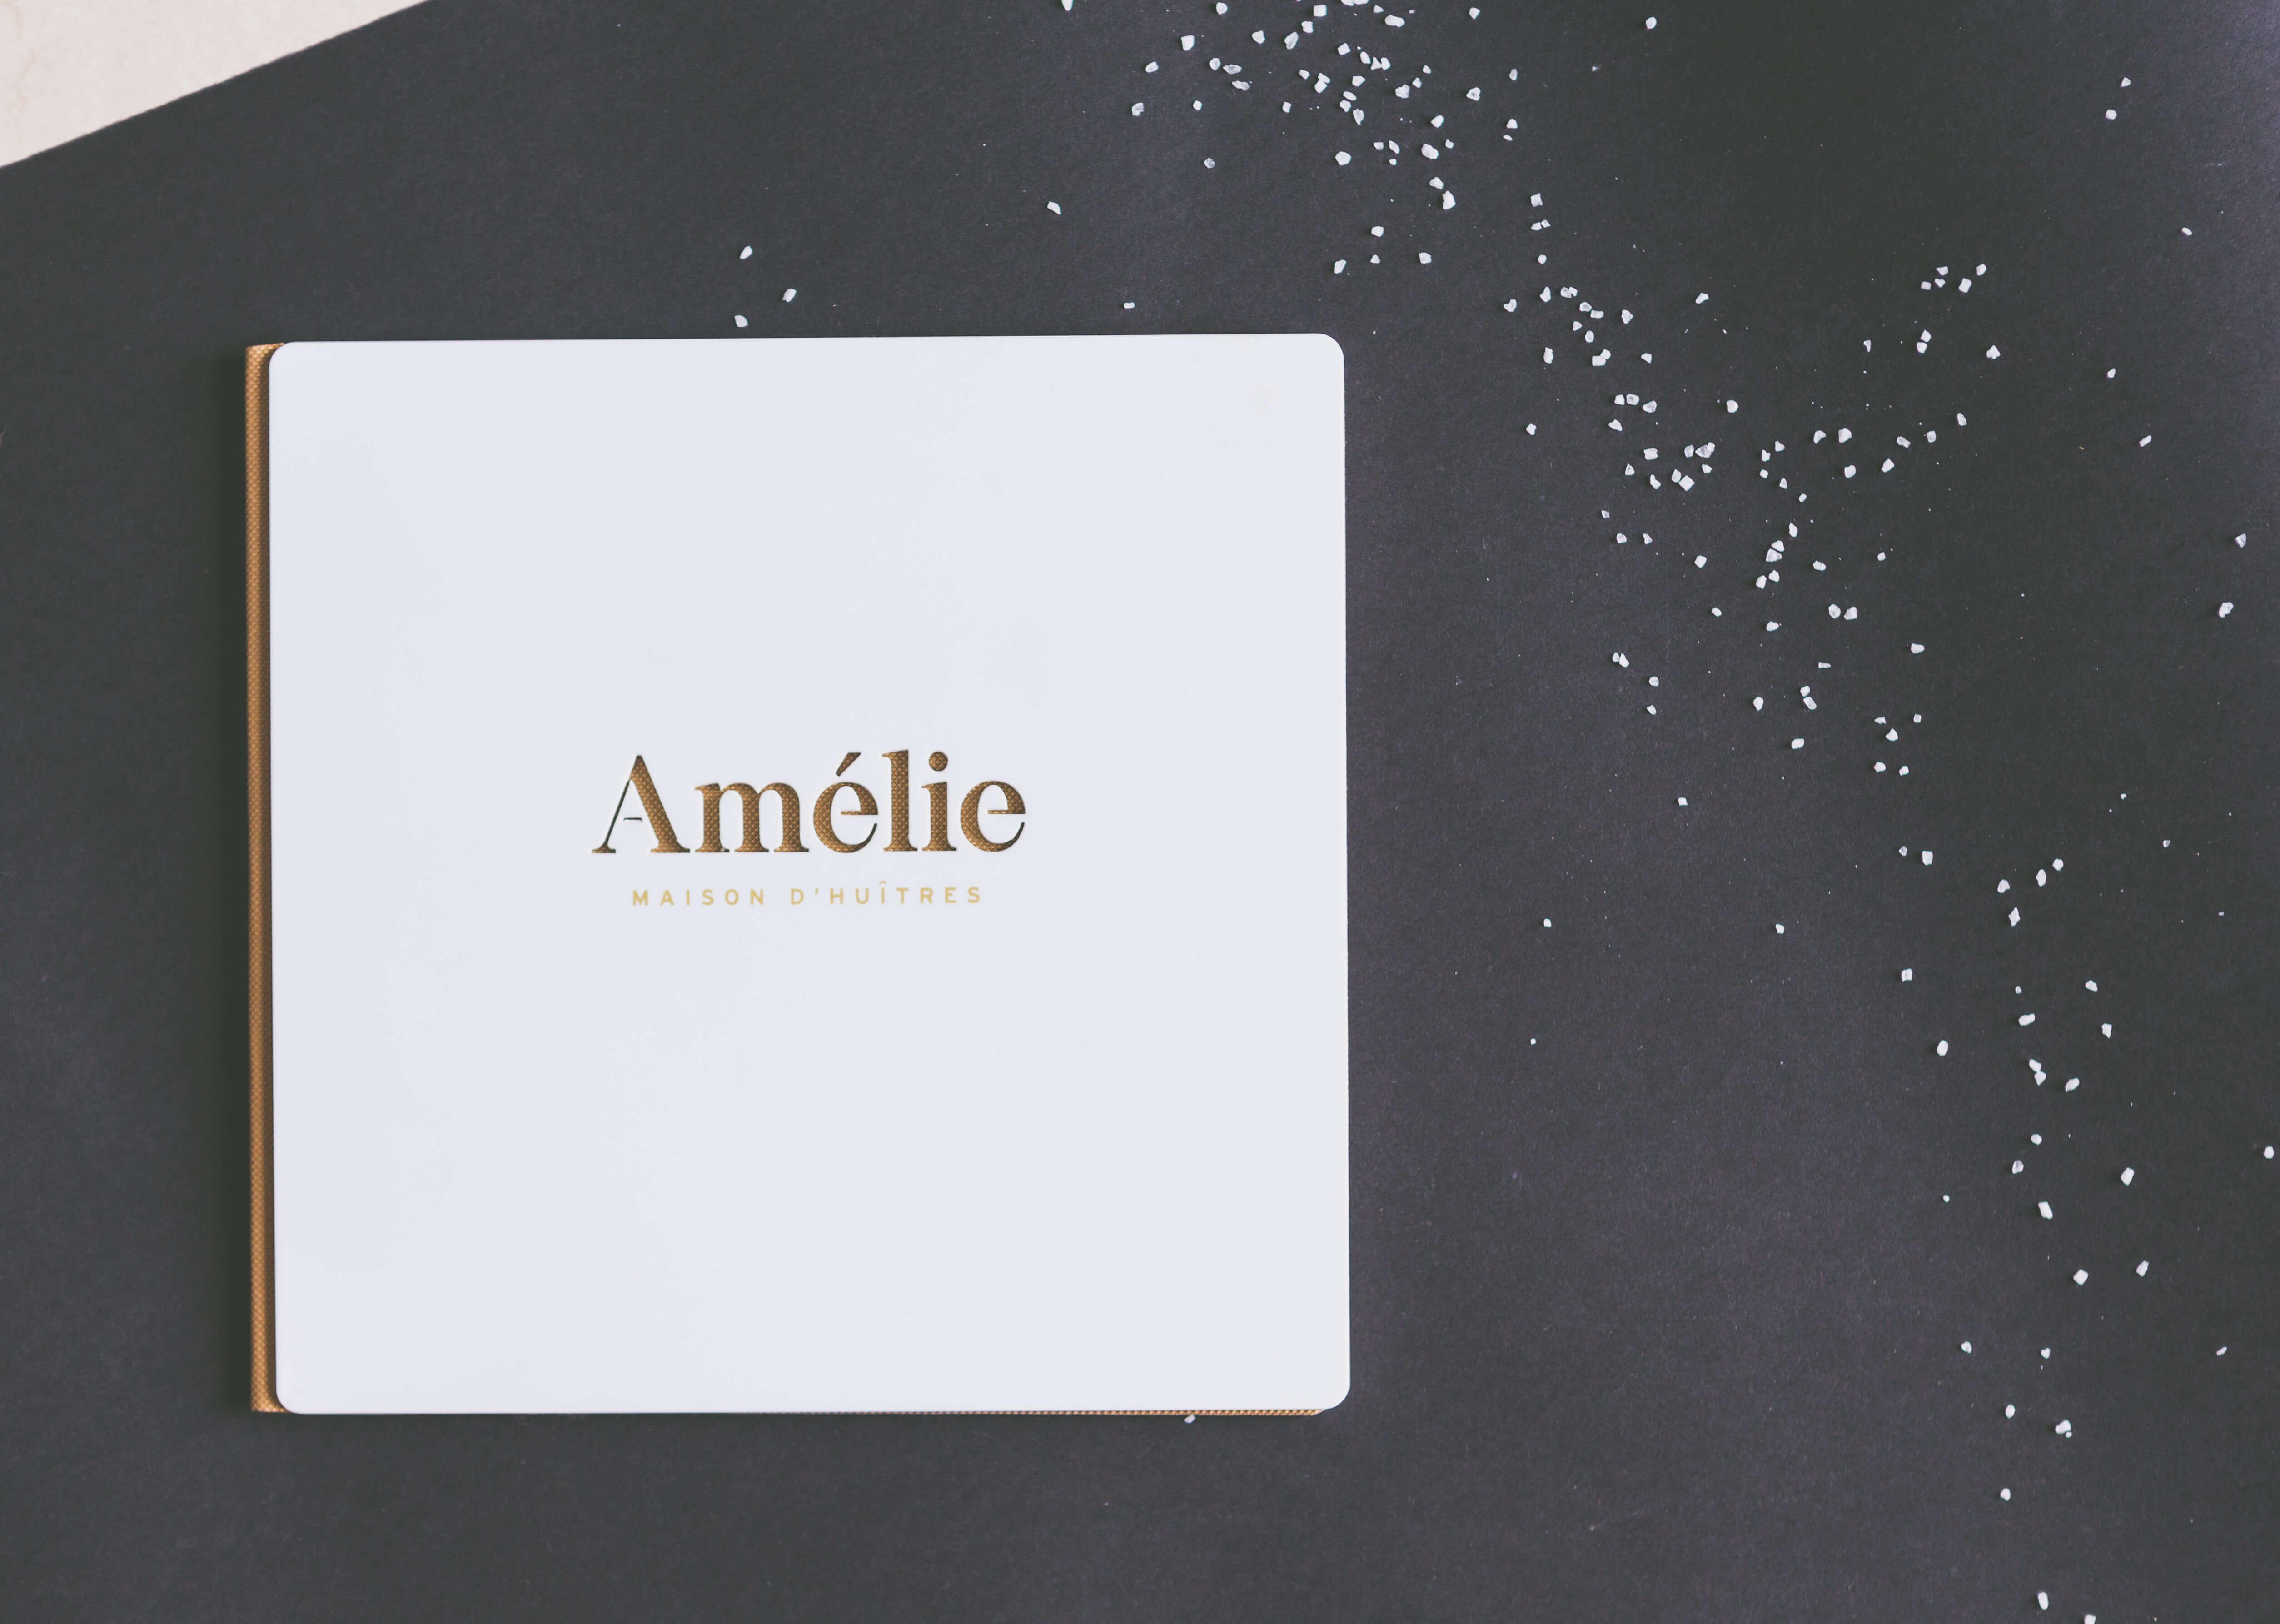 carta blanca de metacrilato para la ostreria Amelie